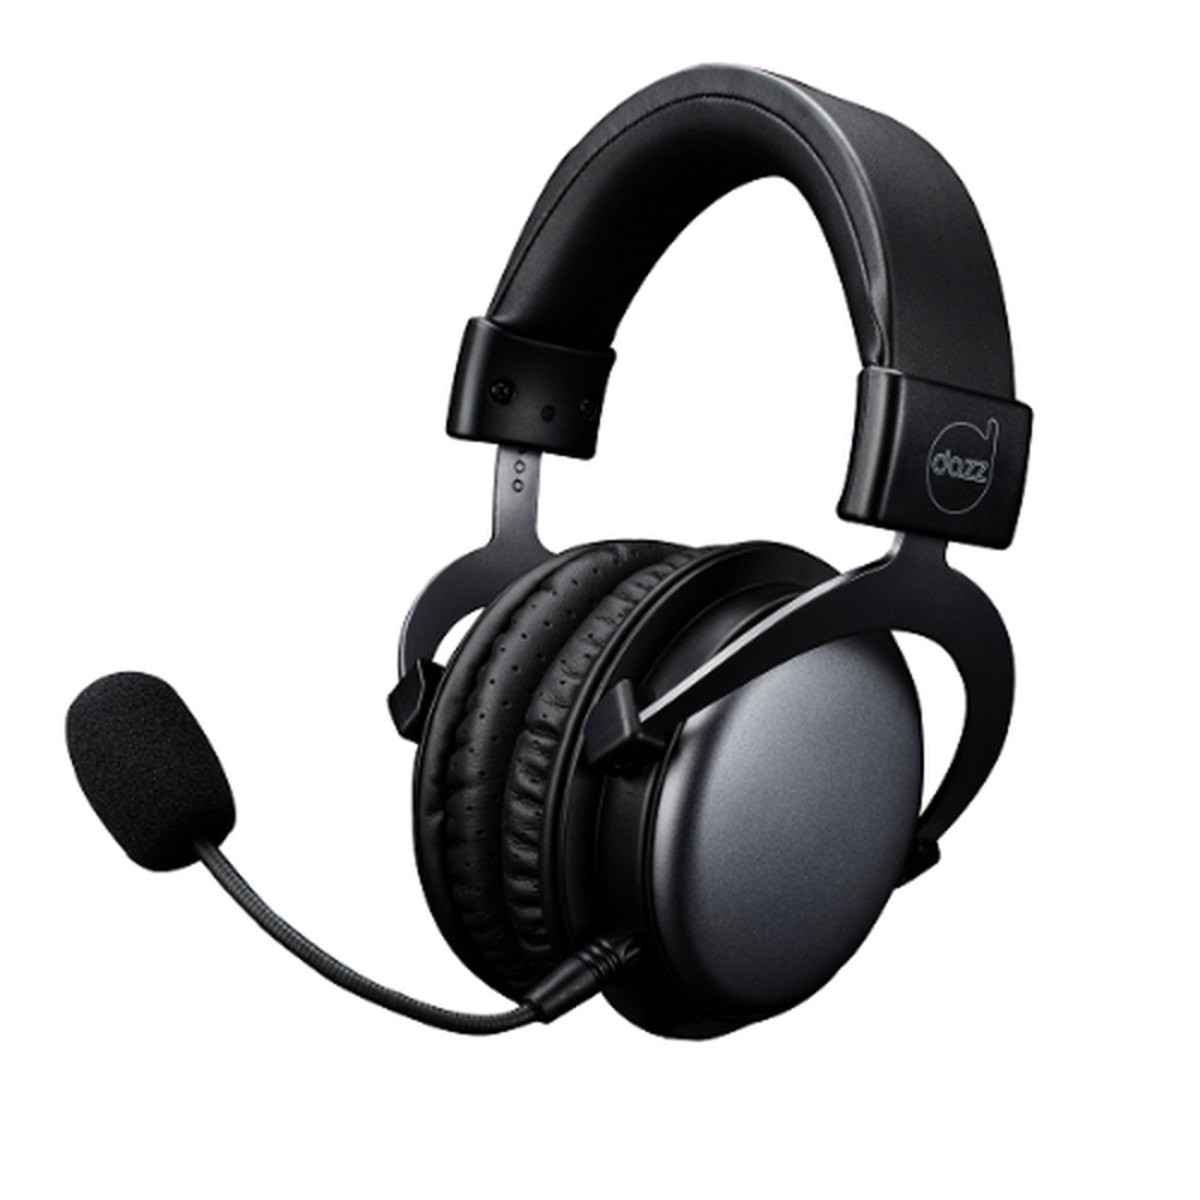 Headset Gamer Dazz, Viper Black, 3.5mm, Multiplataforma, Black, 62000013